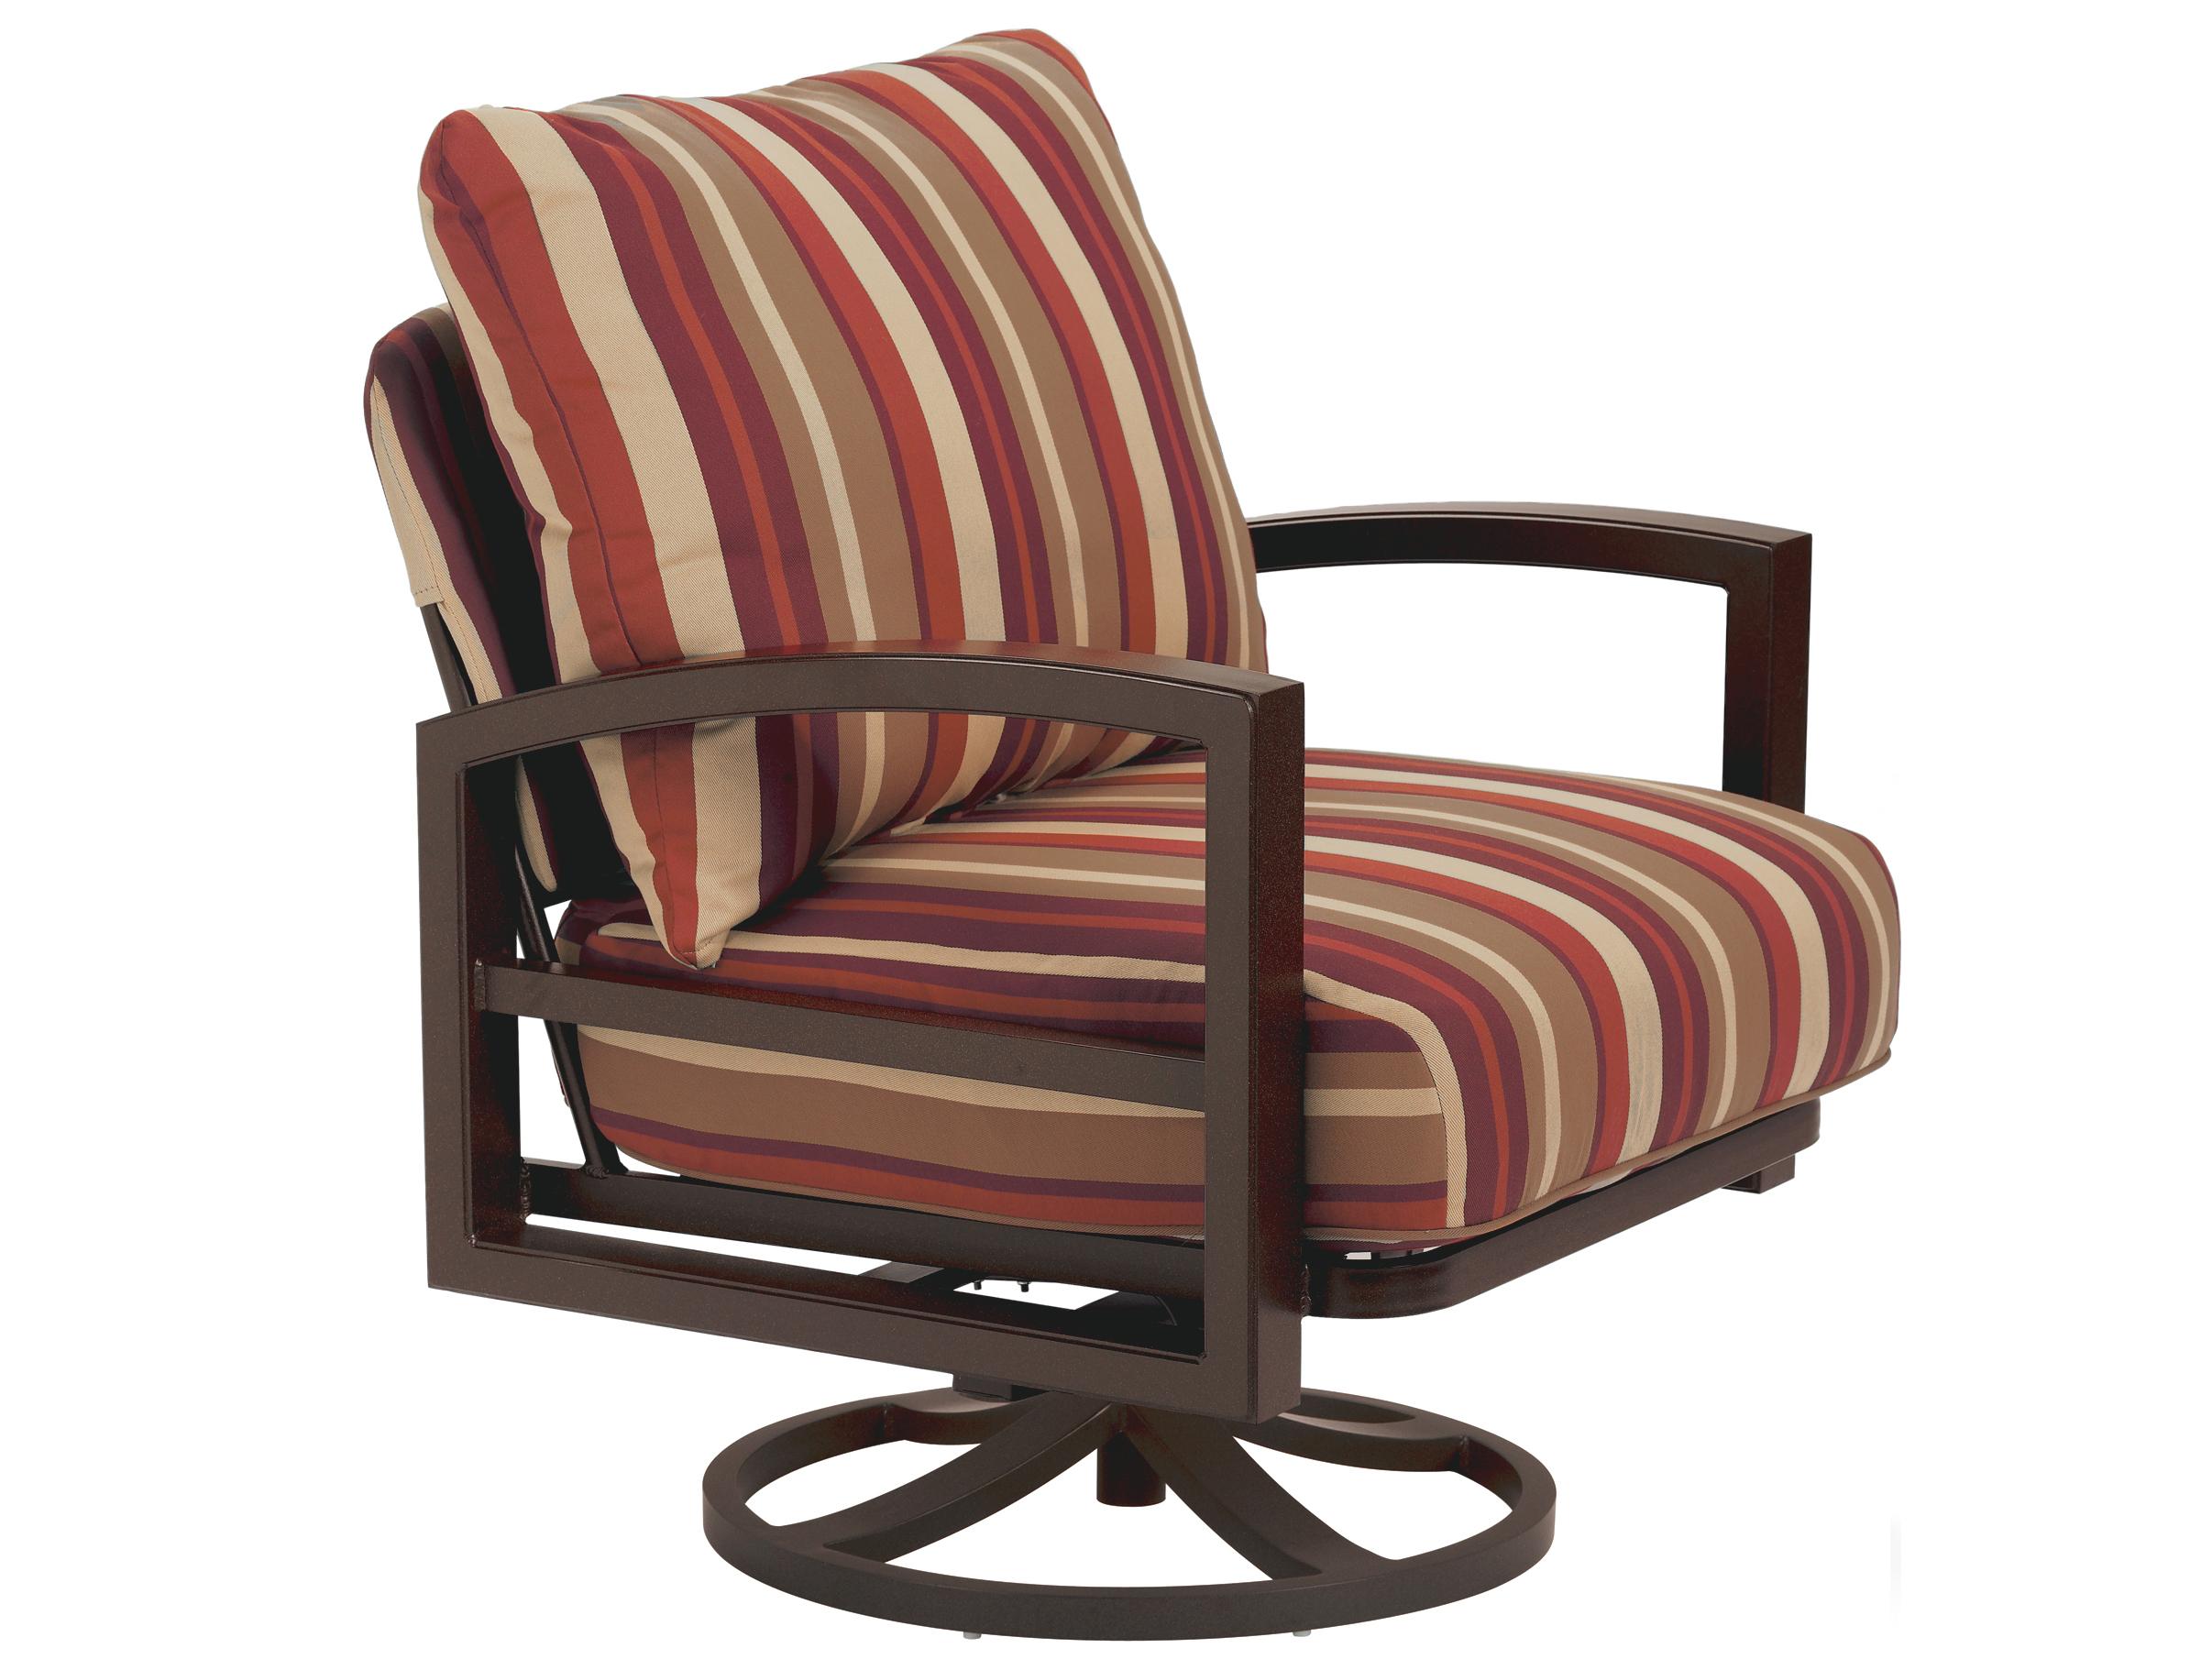 Tropitone Lakeside Cushion Aluminum Swivel Rocker Lounge